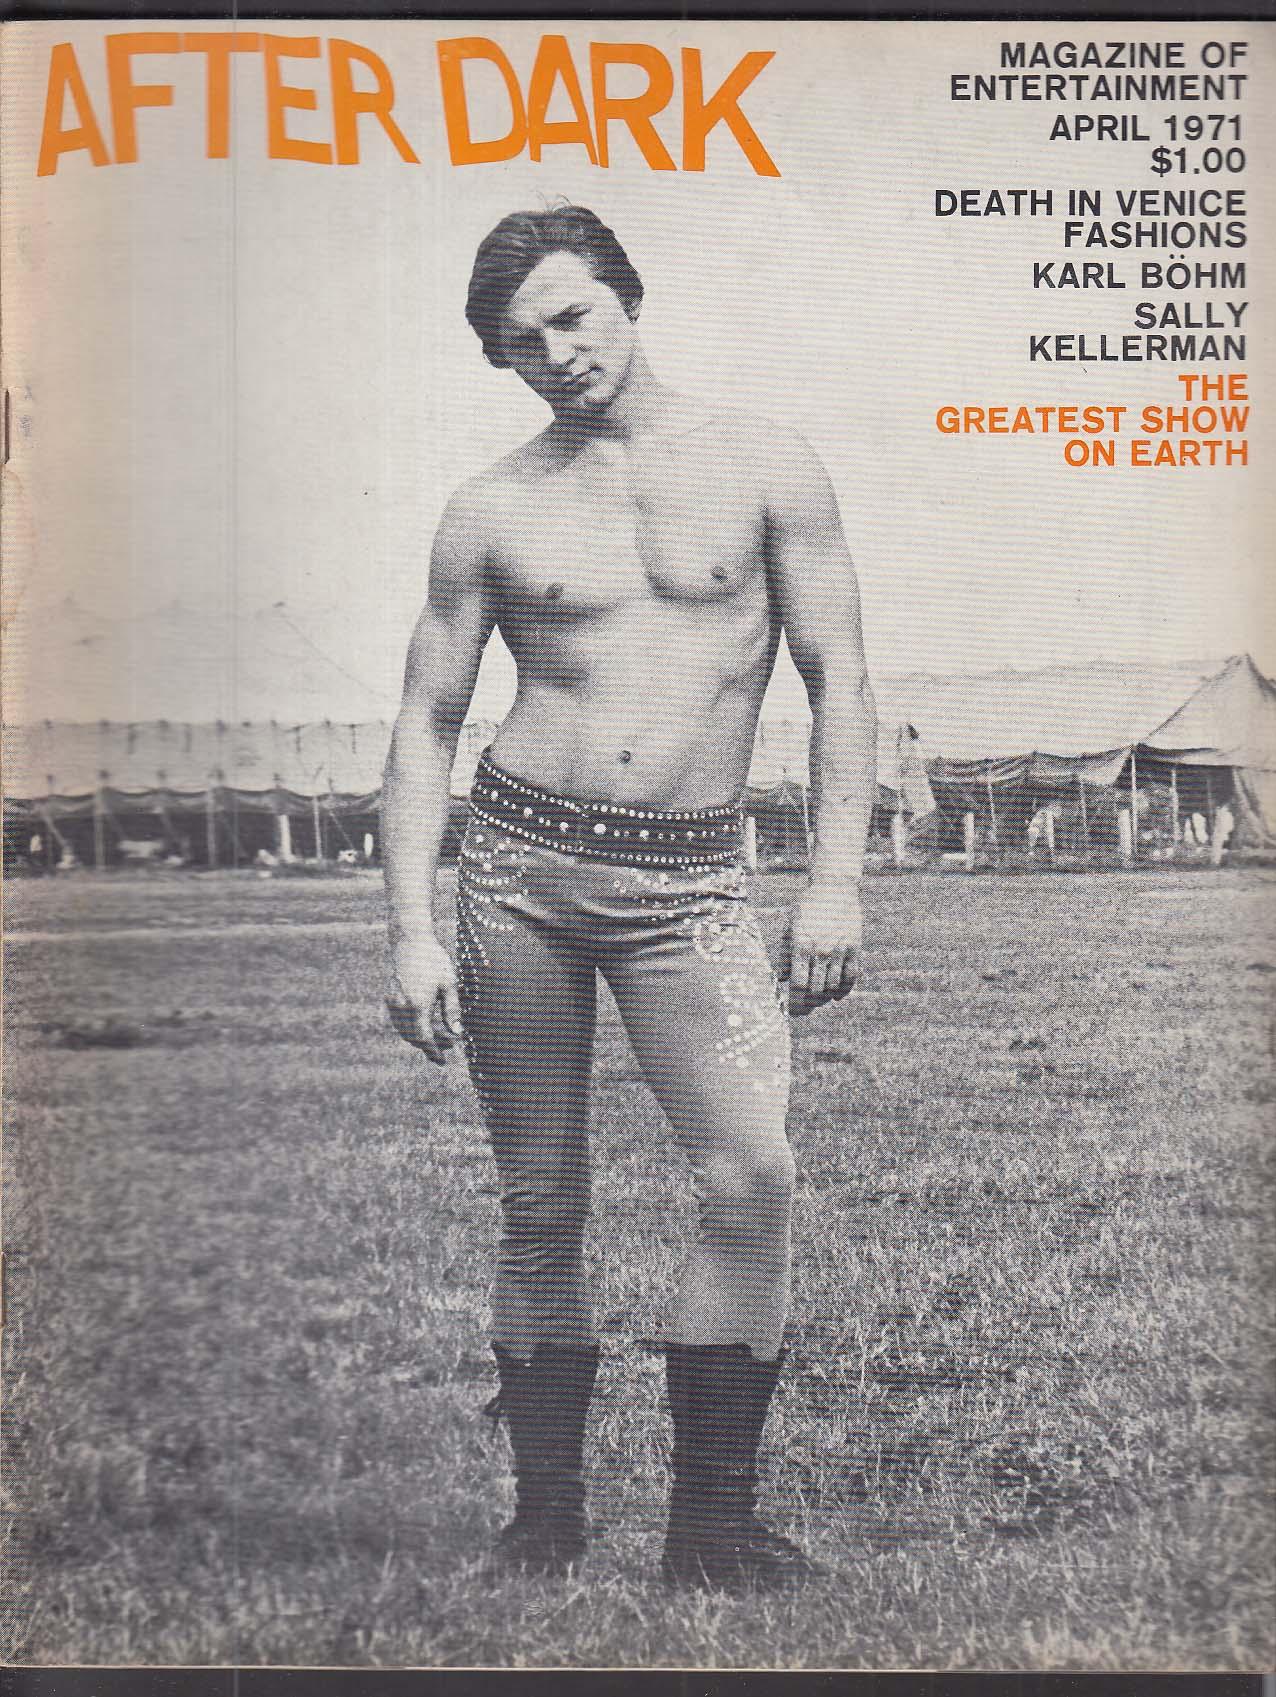 AFTER DARK Andrze Nowacka Karl Bohm Sally Kellerman 4 1971